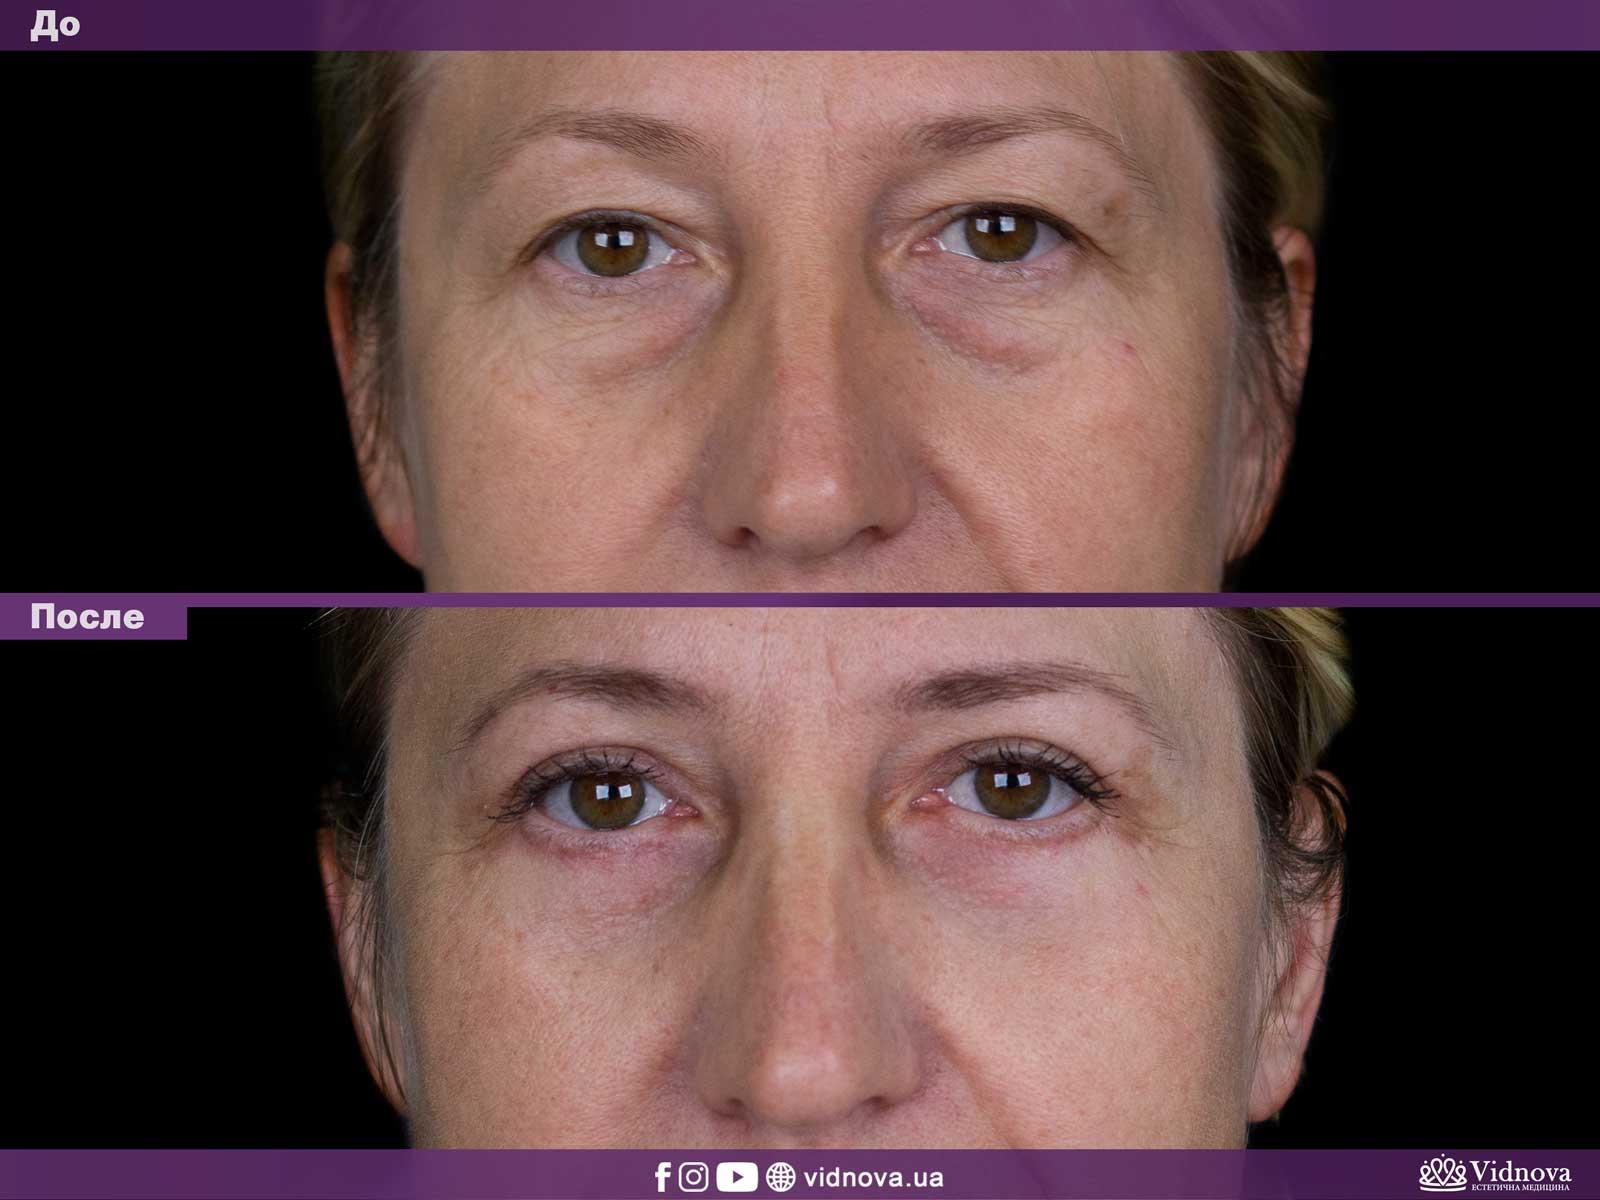 Блефаропластика: Фото До и После - Пример №15-1 - Клиника Vidnova